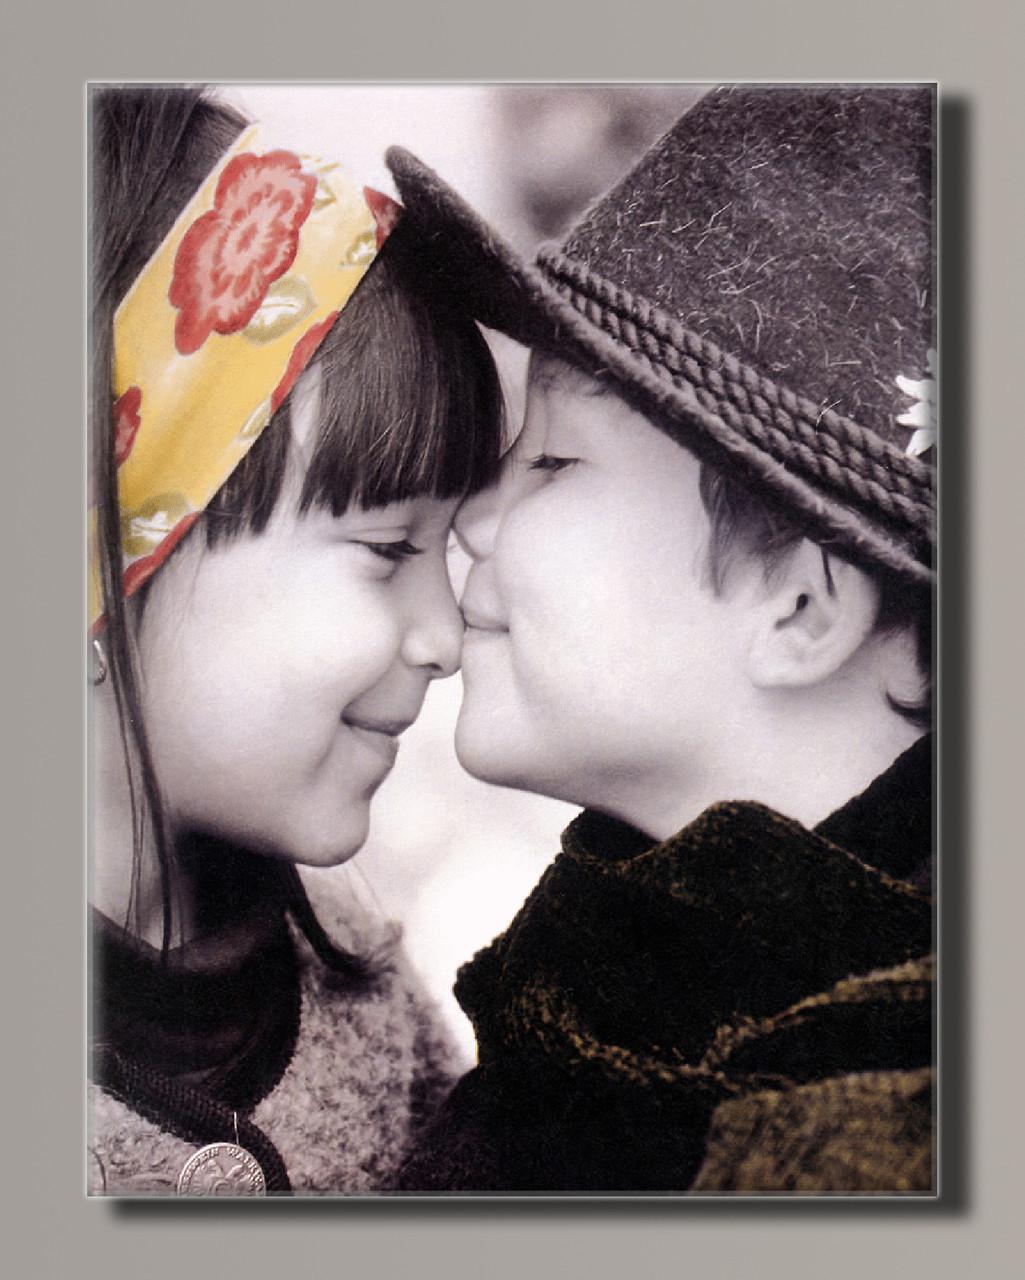 Картина HolstArt Дети от Kim Anderson 42*55 см арт.HAS-443